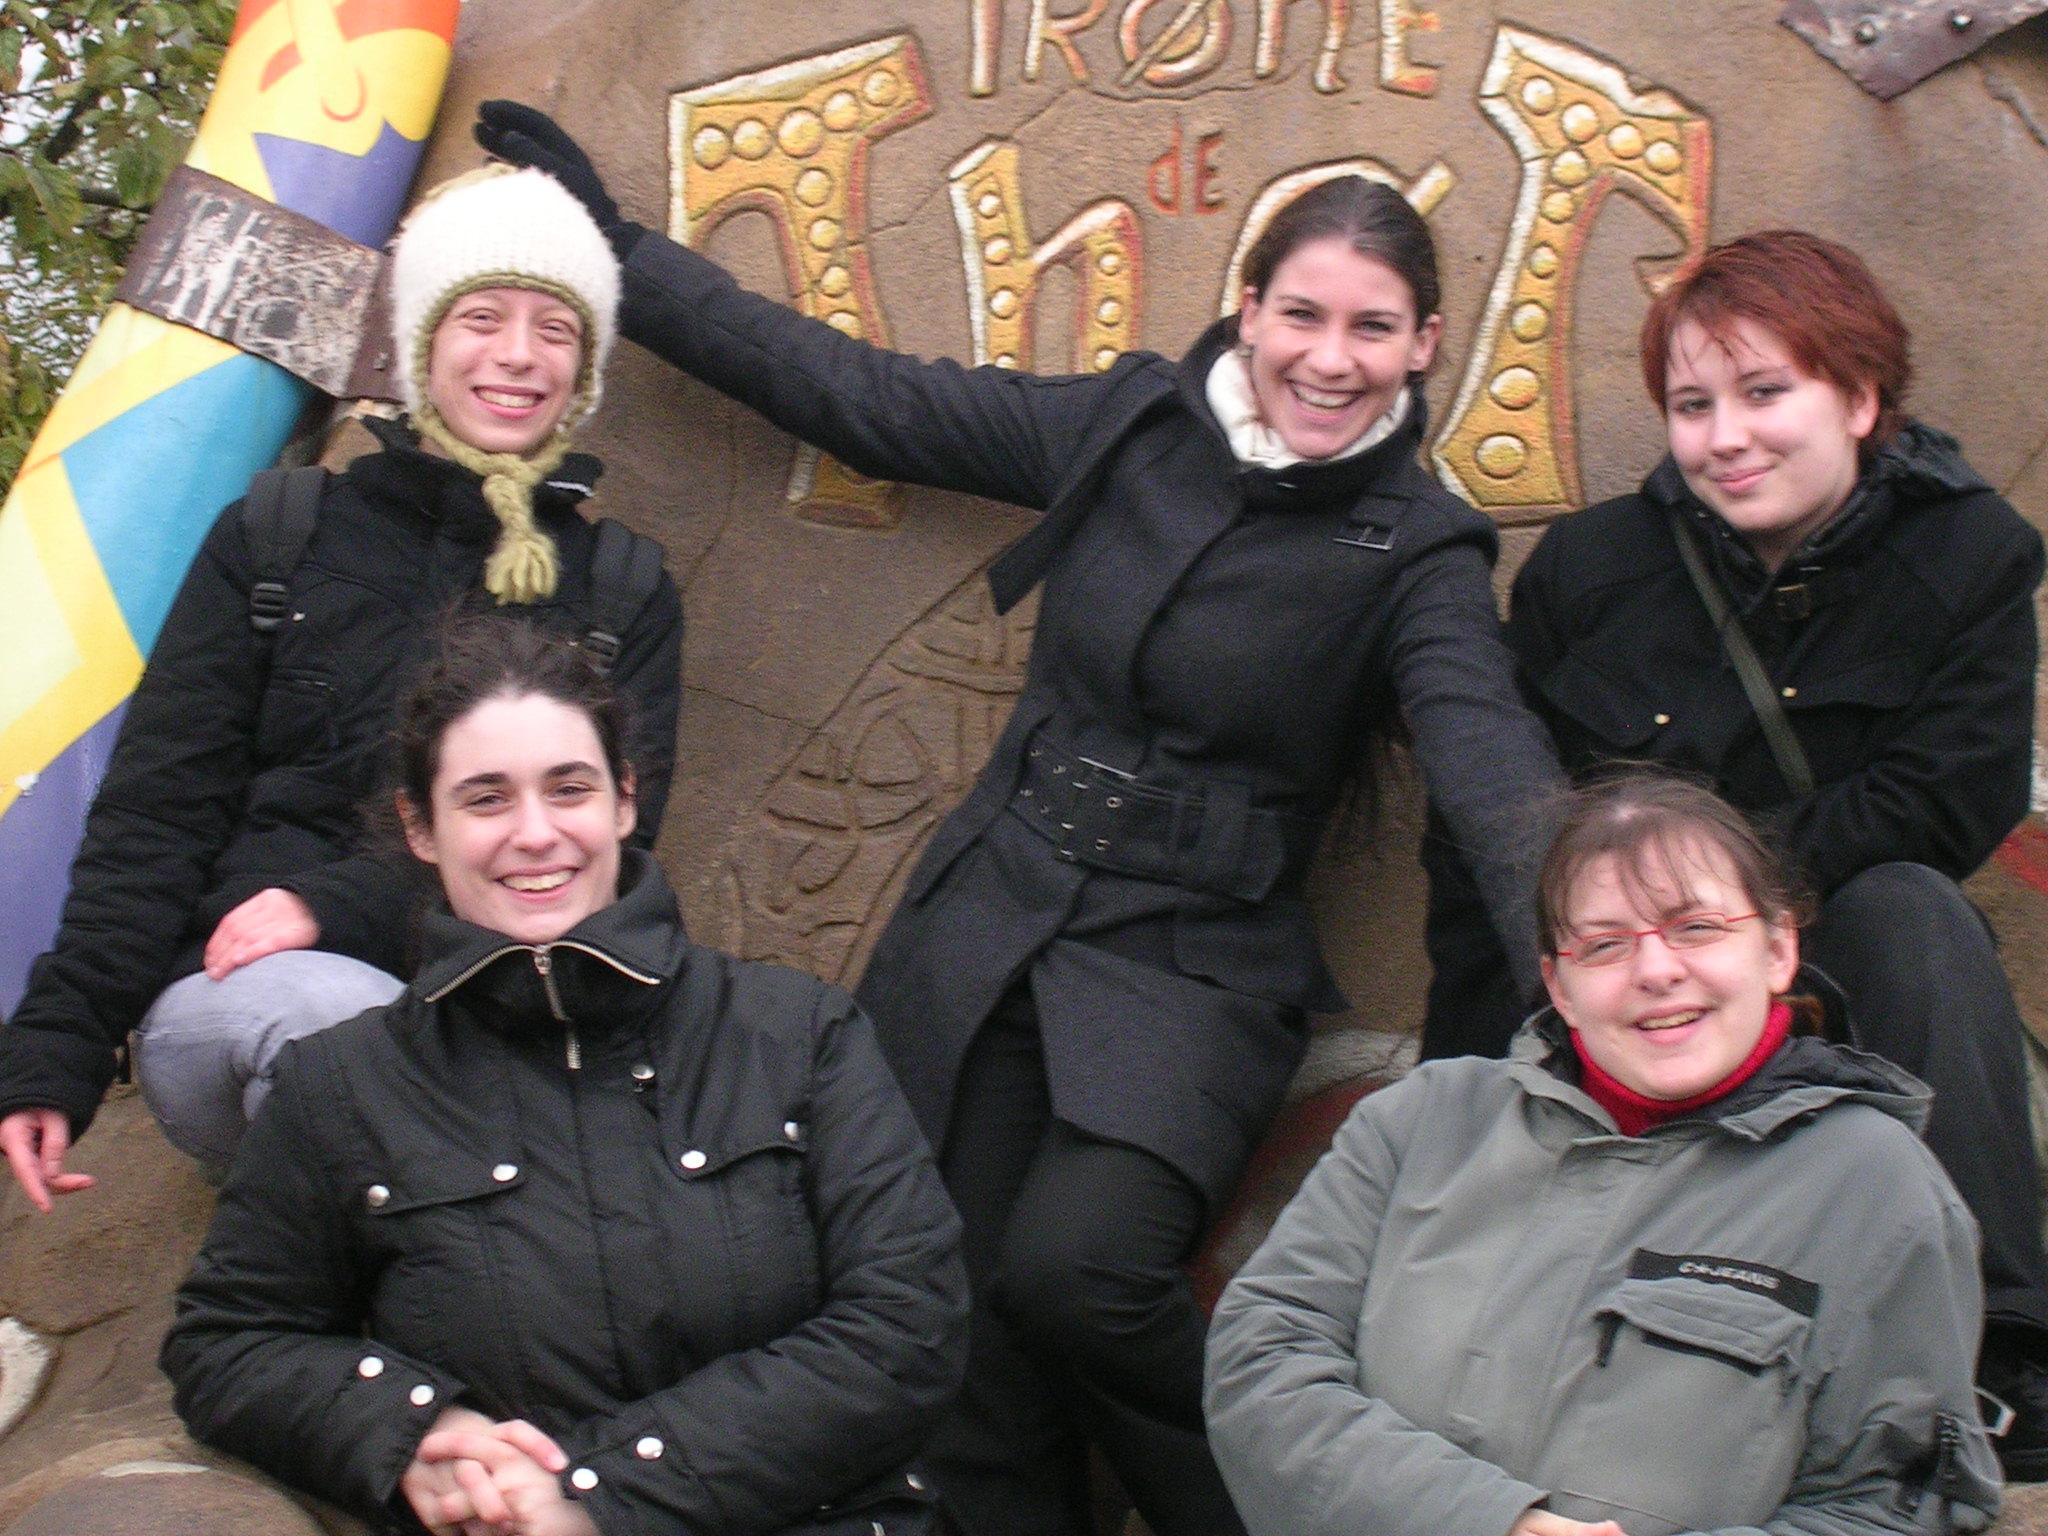 Photo 24 - Des femmes, des vraies! (Mara_Jade, Kenda, Camie, Padmeia, AngeSolo)